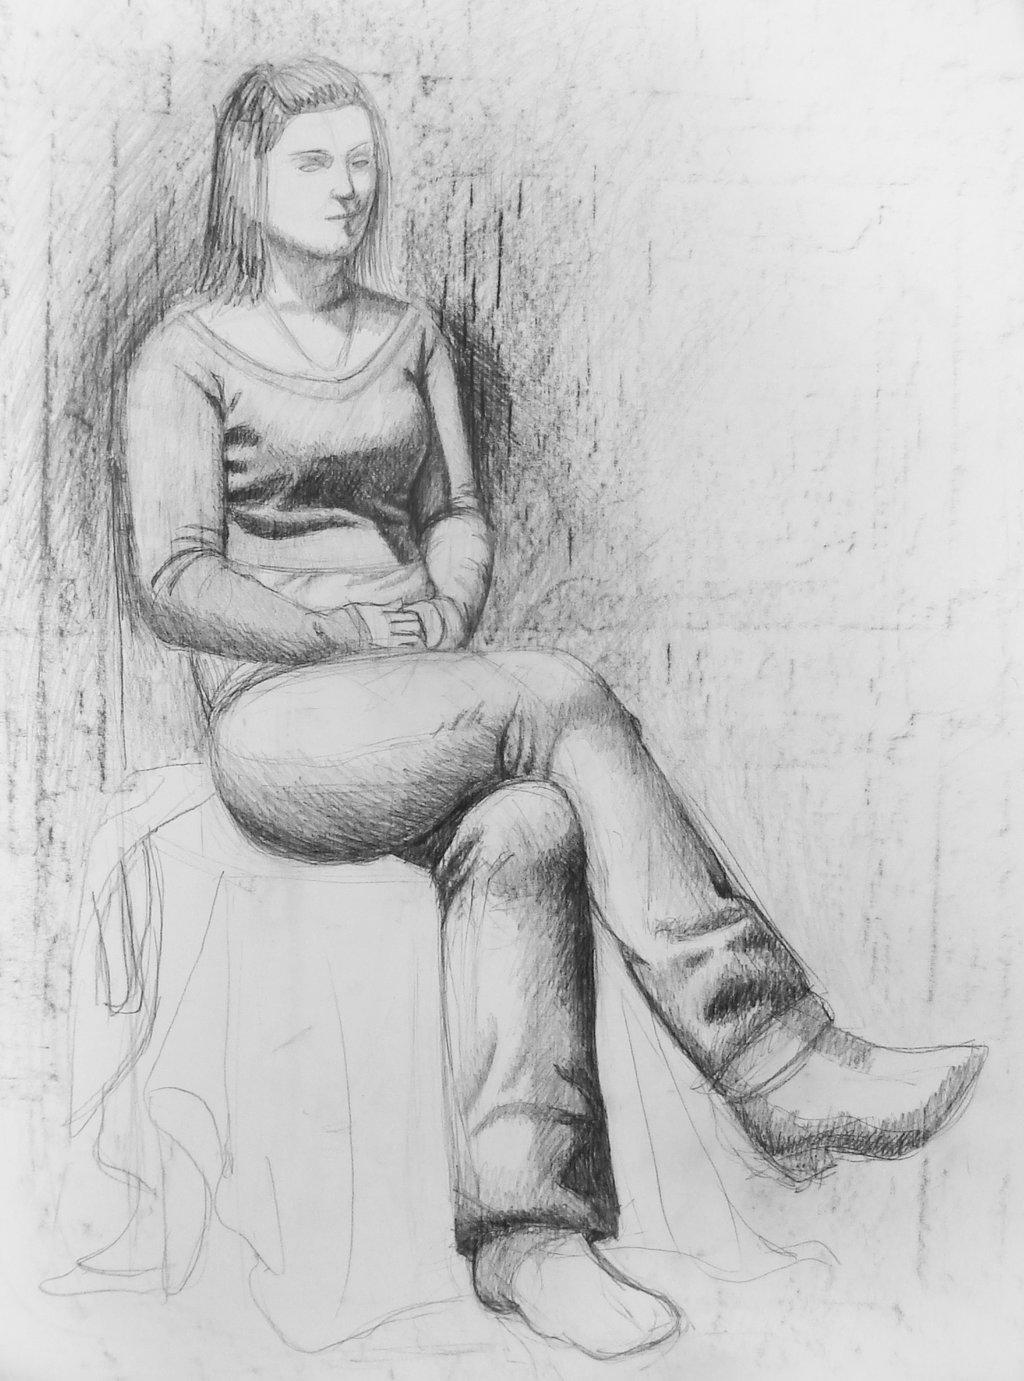 Drawn figurine pencil full body Full portrait body body DeviantArt